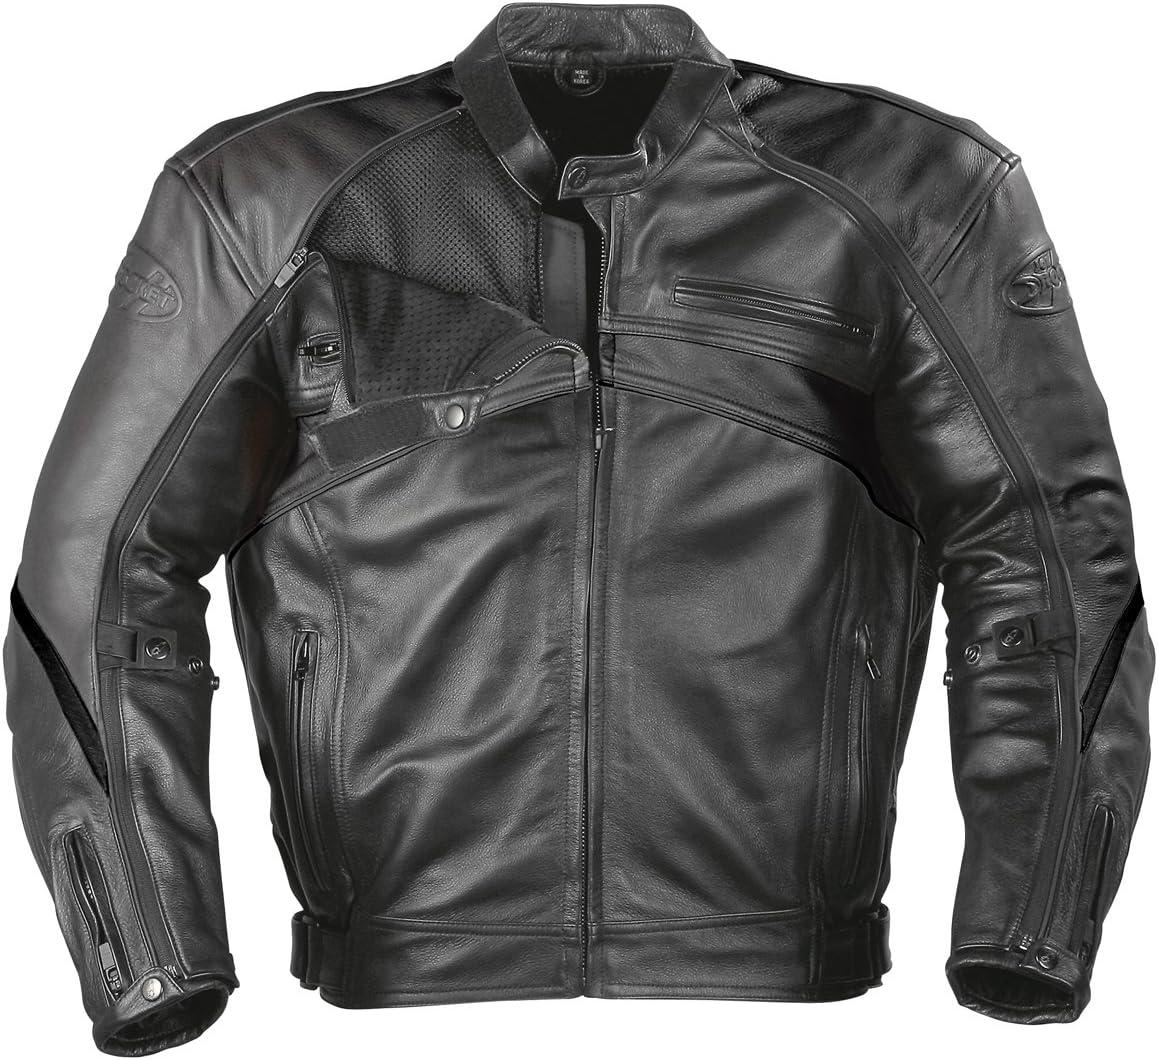 Joe Rocket Superego Men's Hybrid Leather/Mesh Motorcycle Jacket